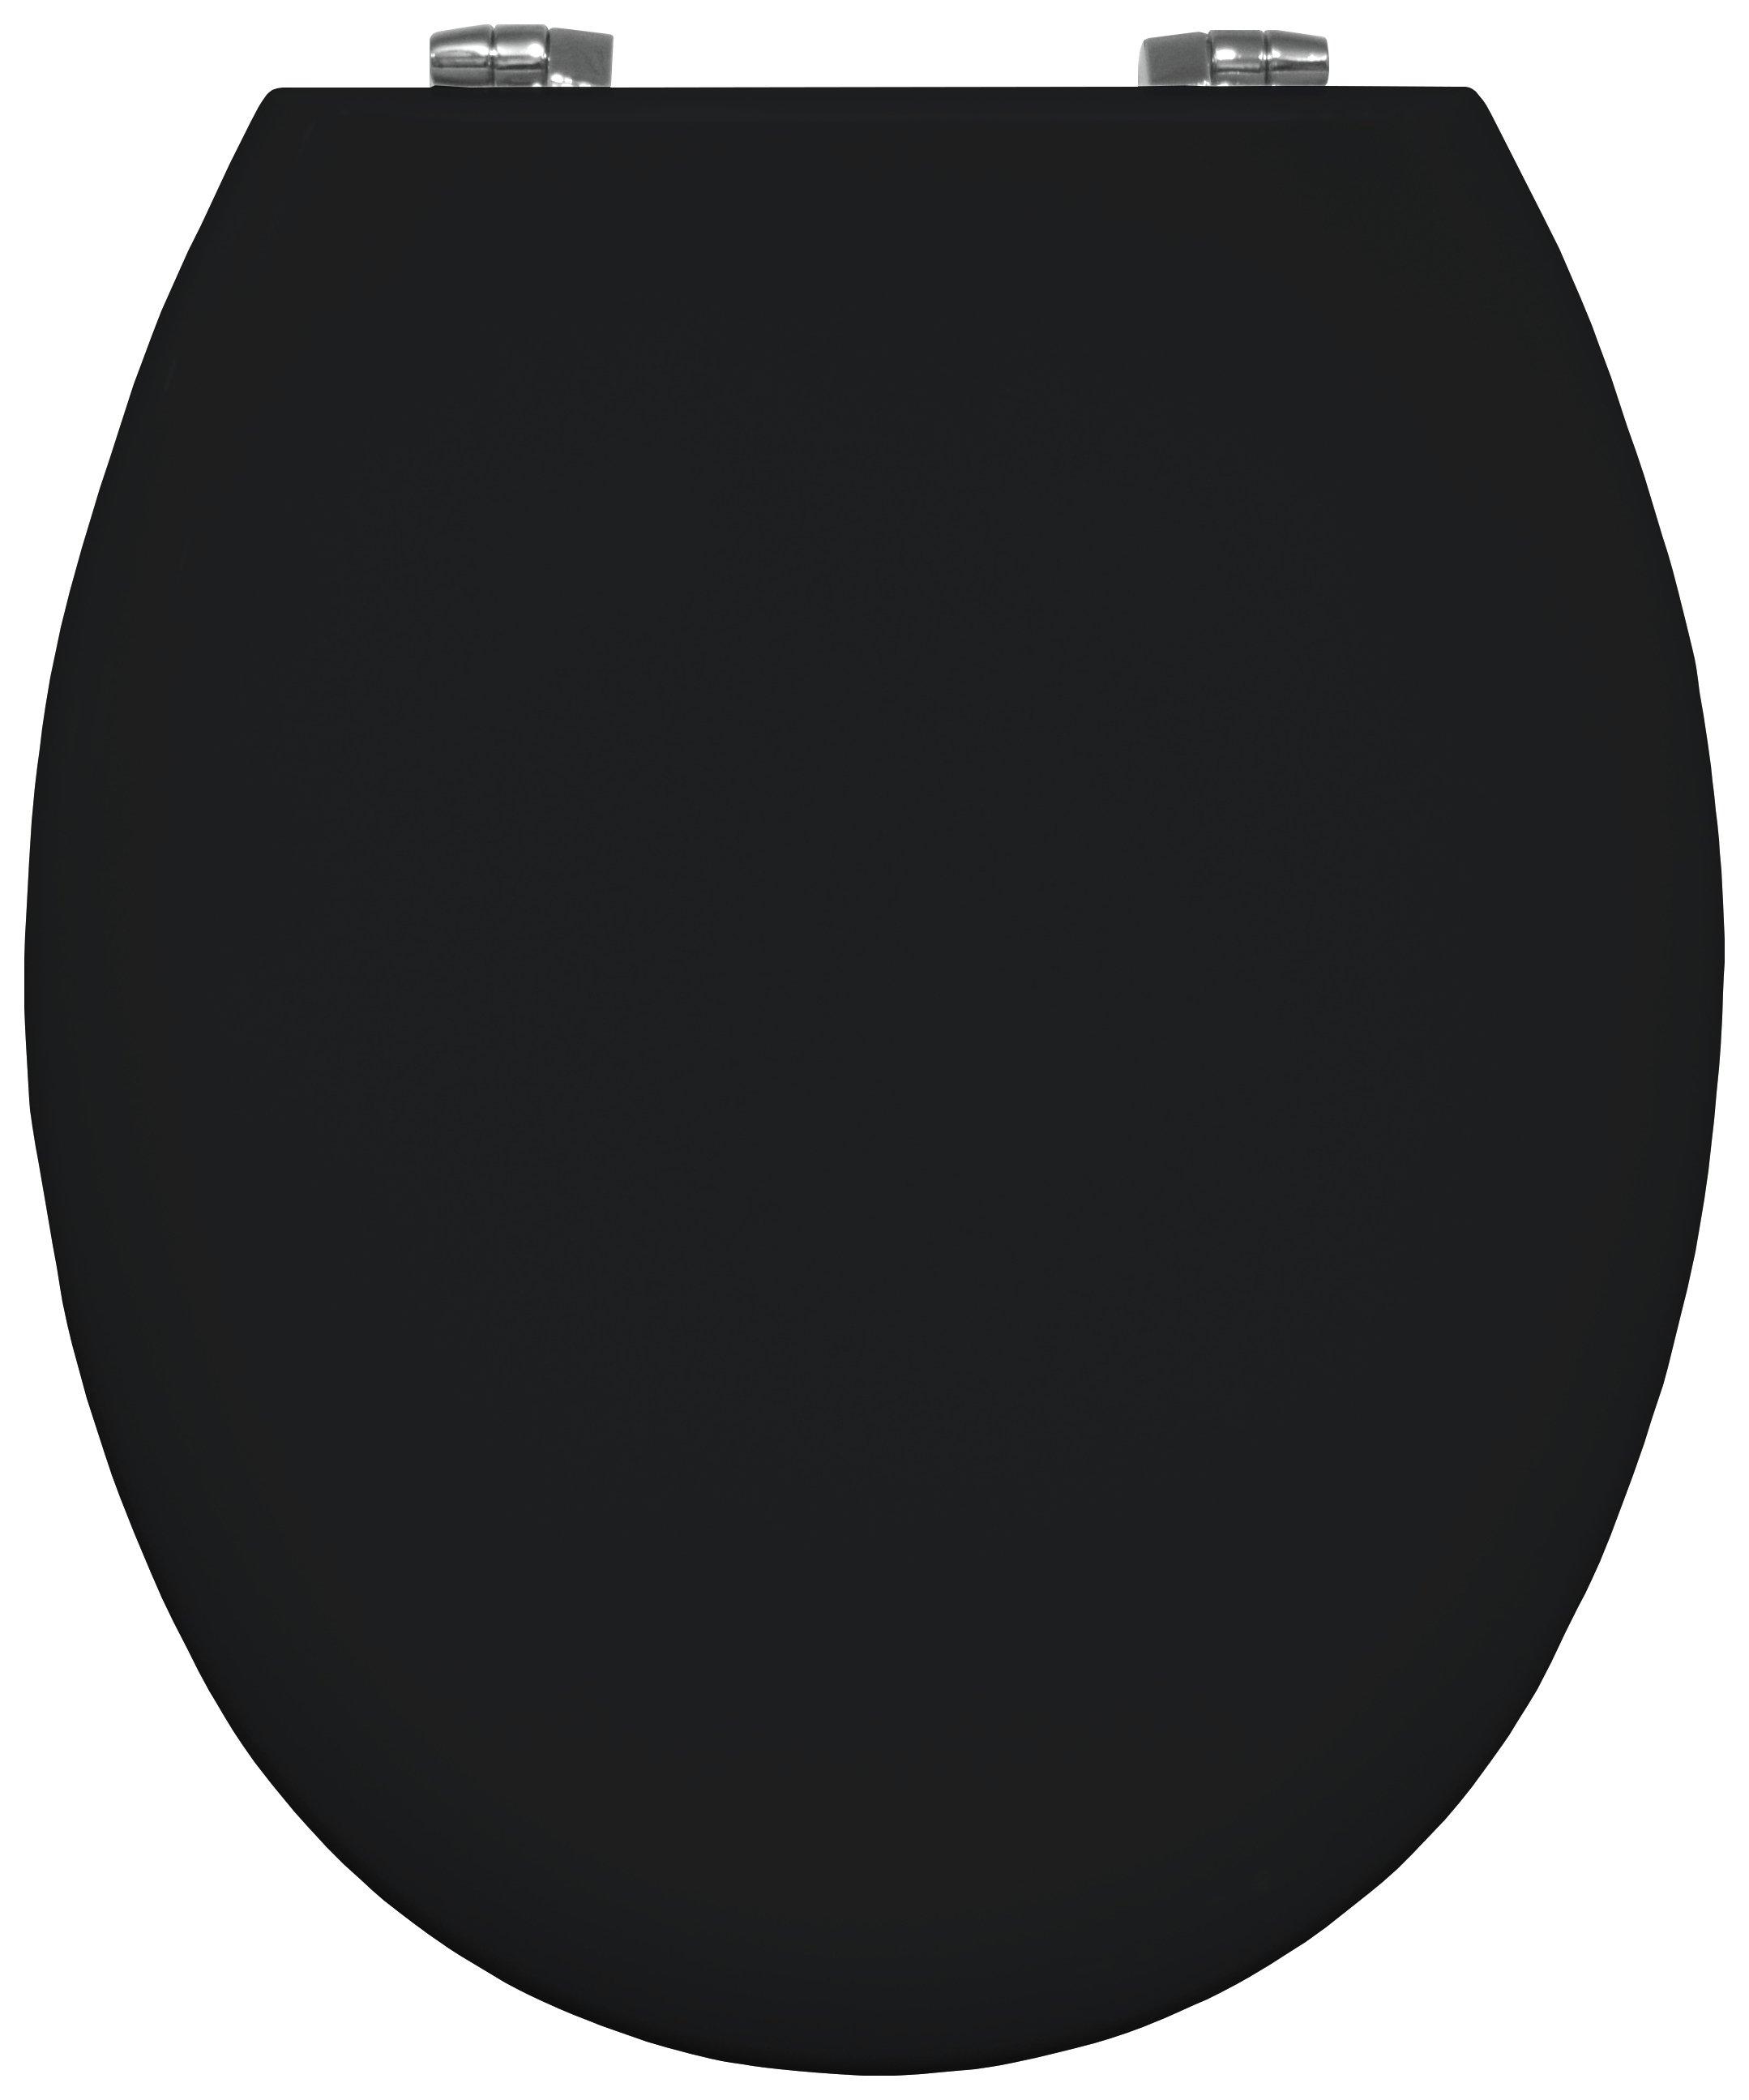 Bemis Phoenix Statite Slow Close Toilet Seat - Black